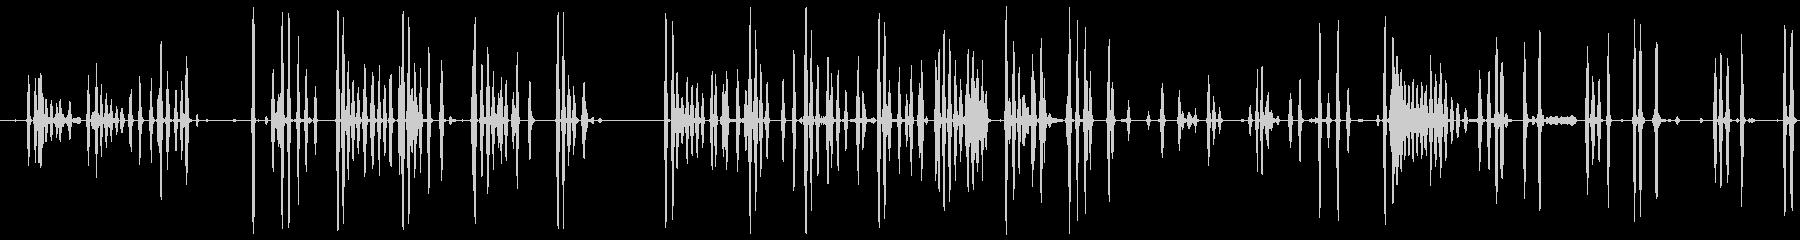 DOG BARKING 11、シベ...の未再生の波形